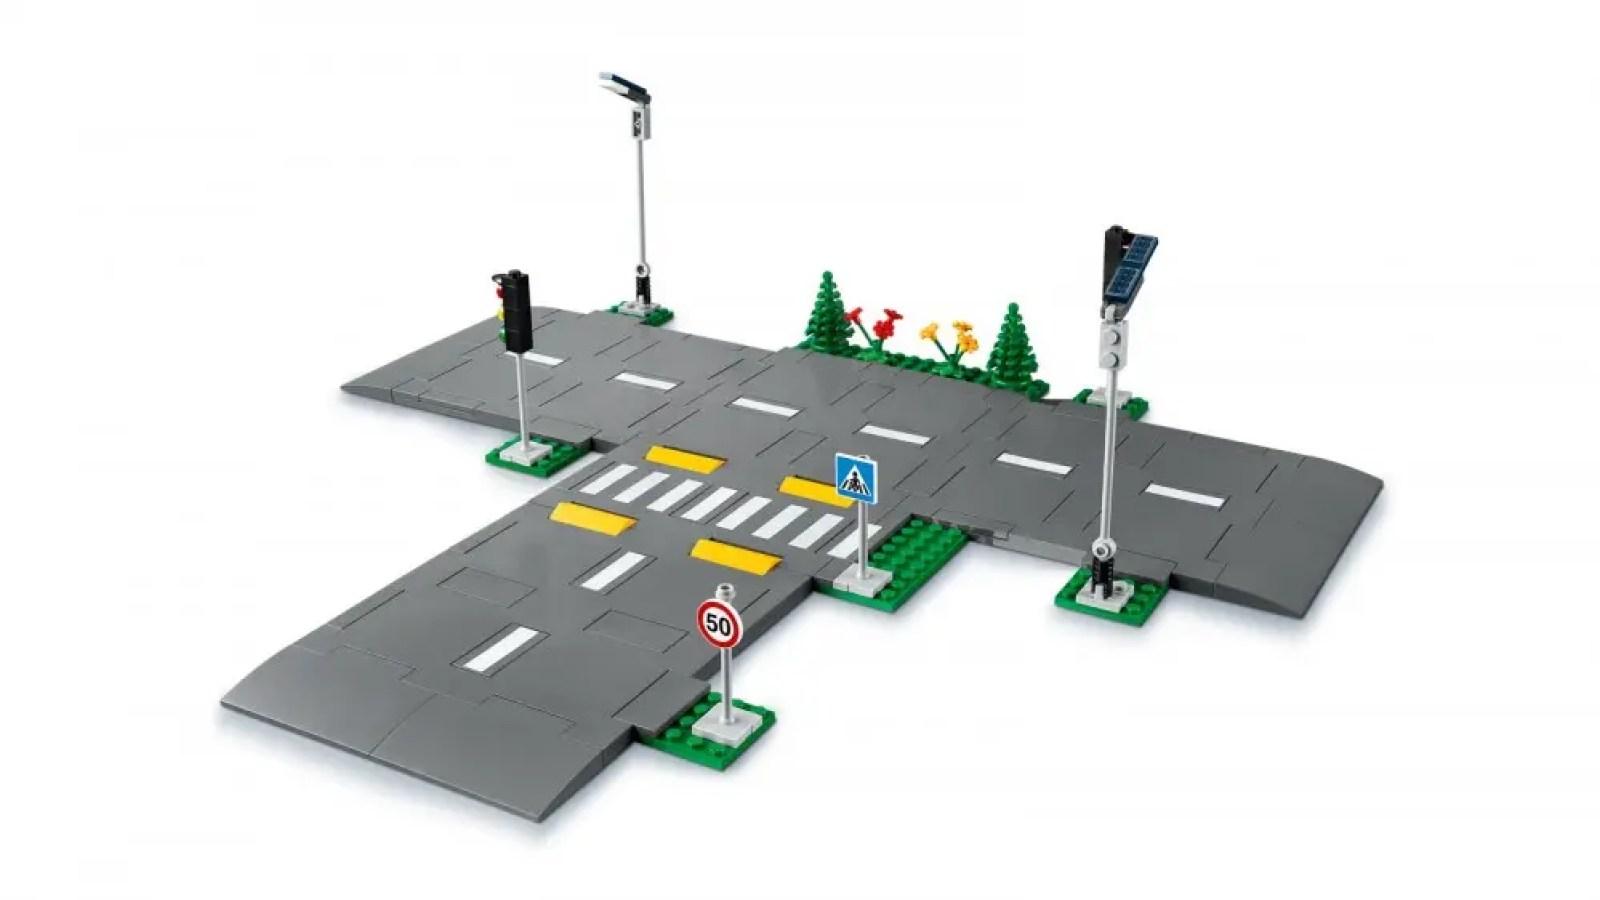 A closeup of a LEGO modular road system